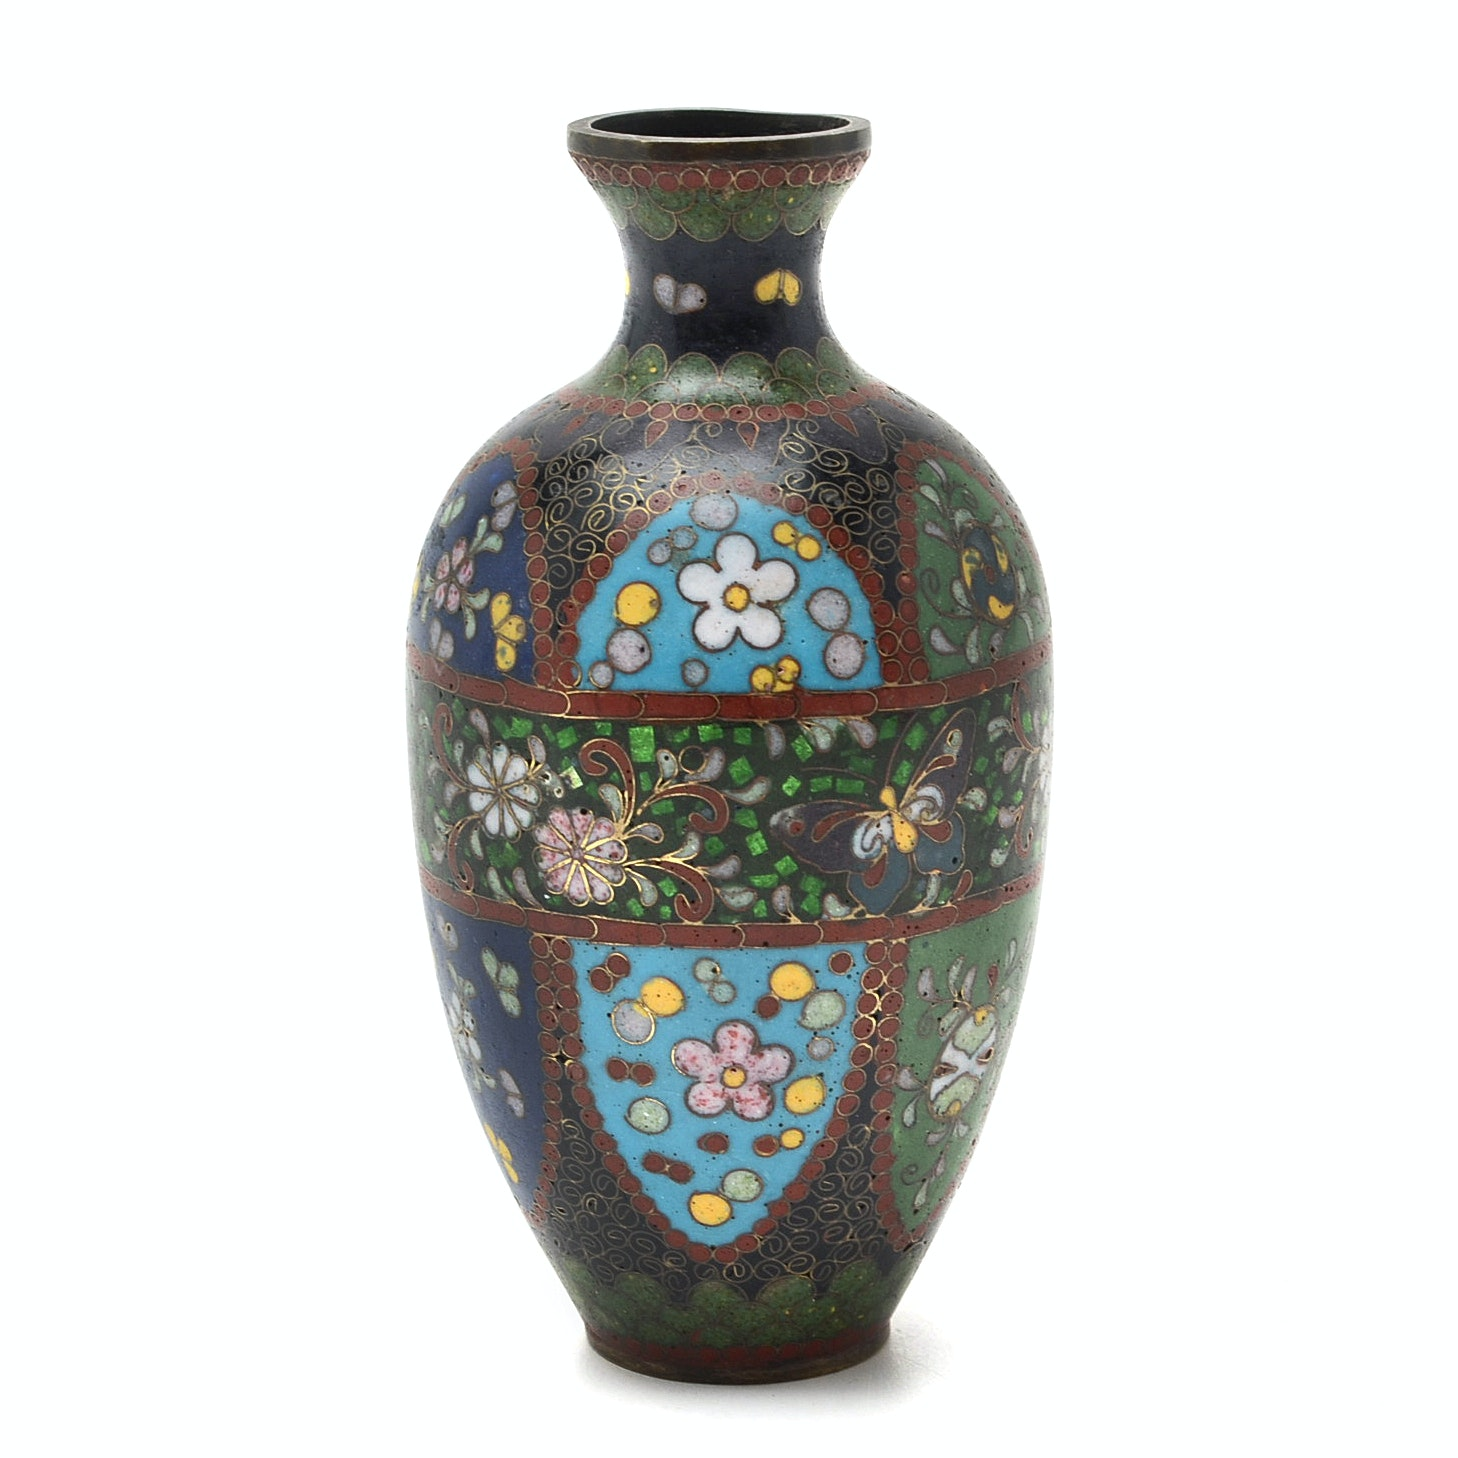 Takahara Komakichi Japanese Cloisonné Vase